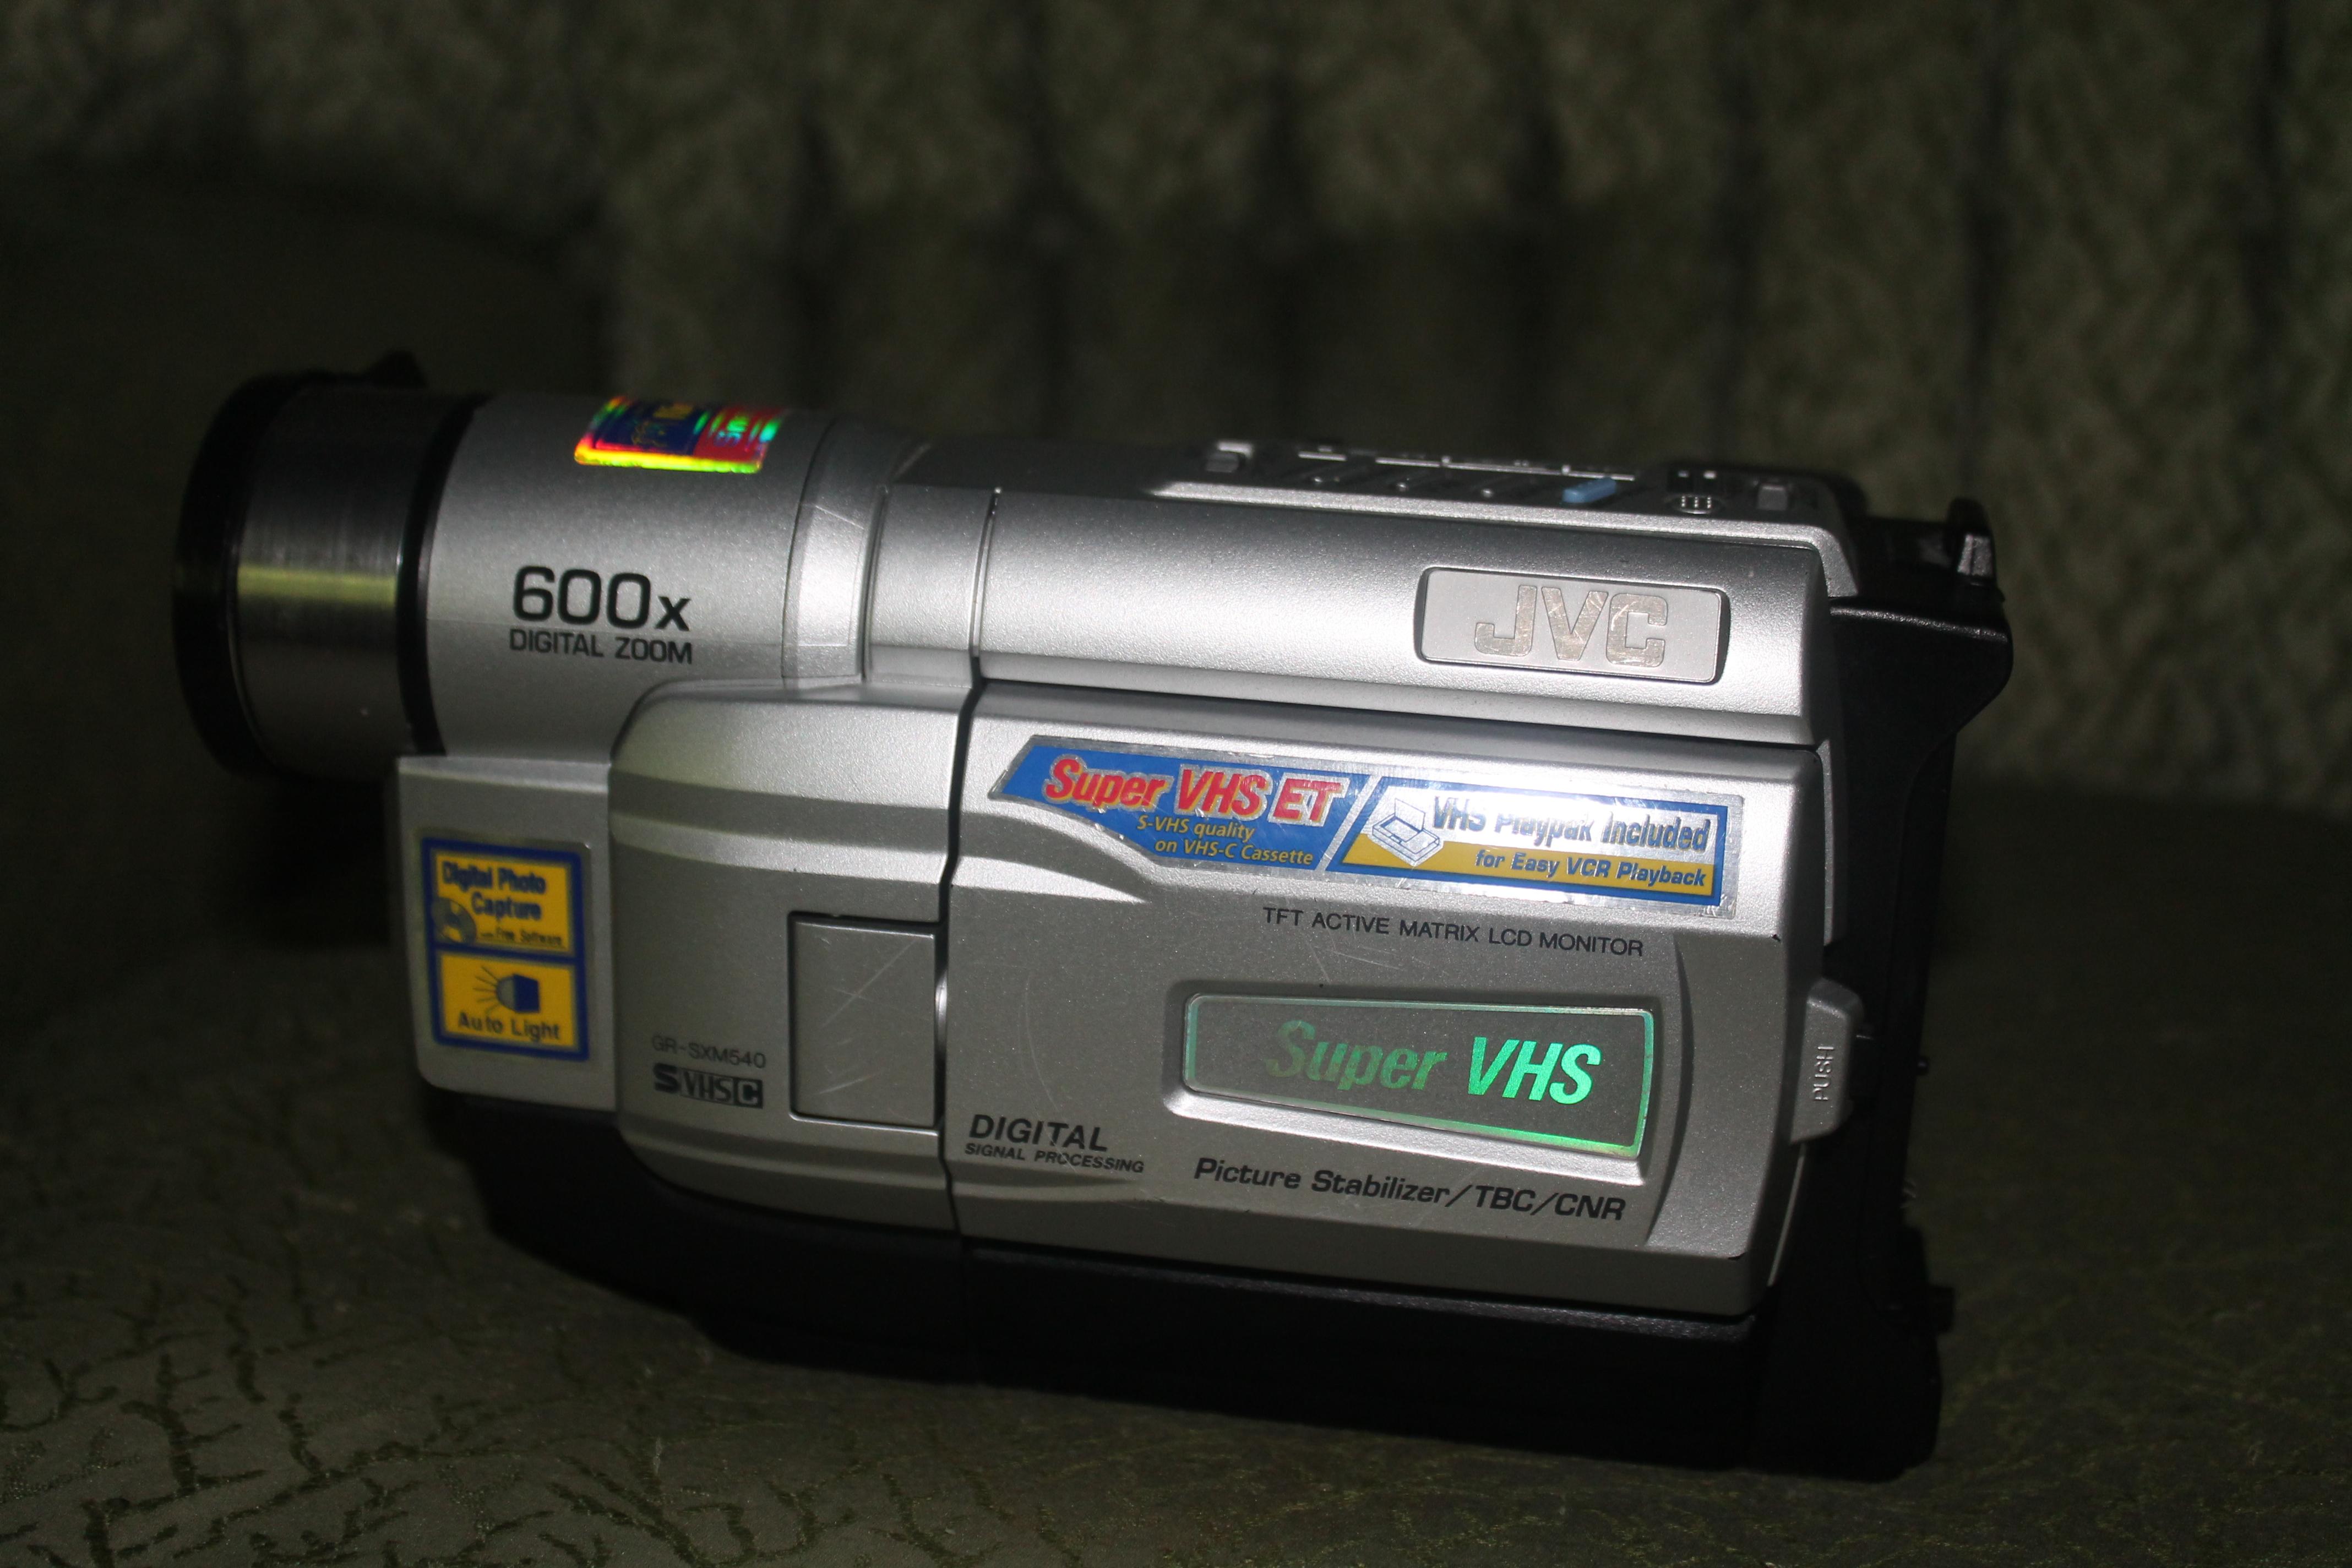 Jvc Gr Sxmx40 Series Camcorderpedia Wiki Fandom